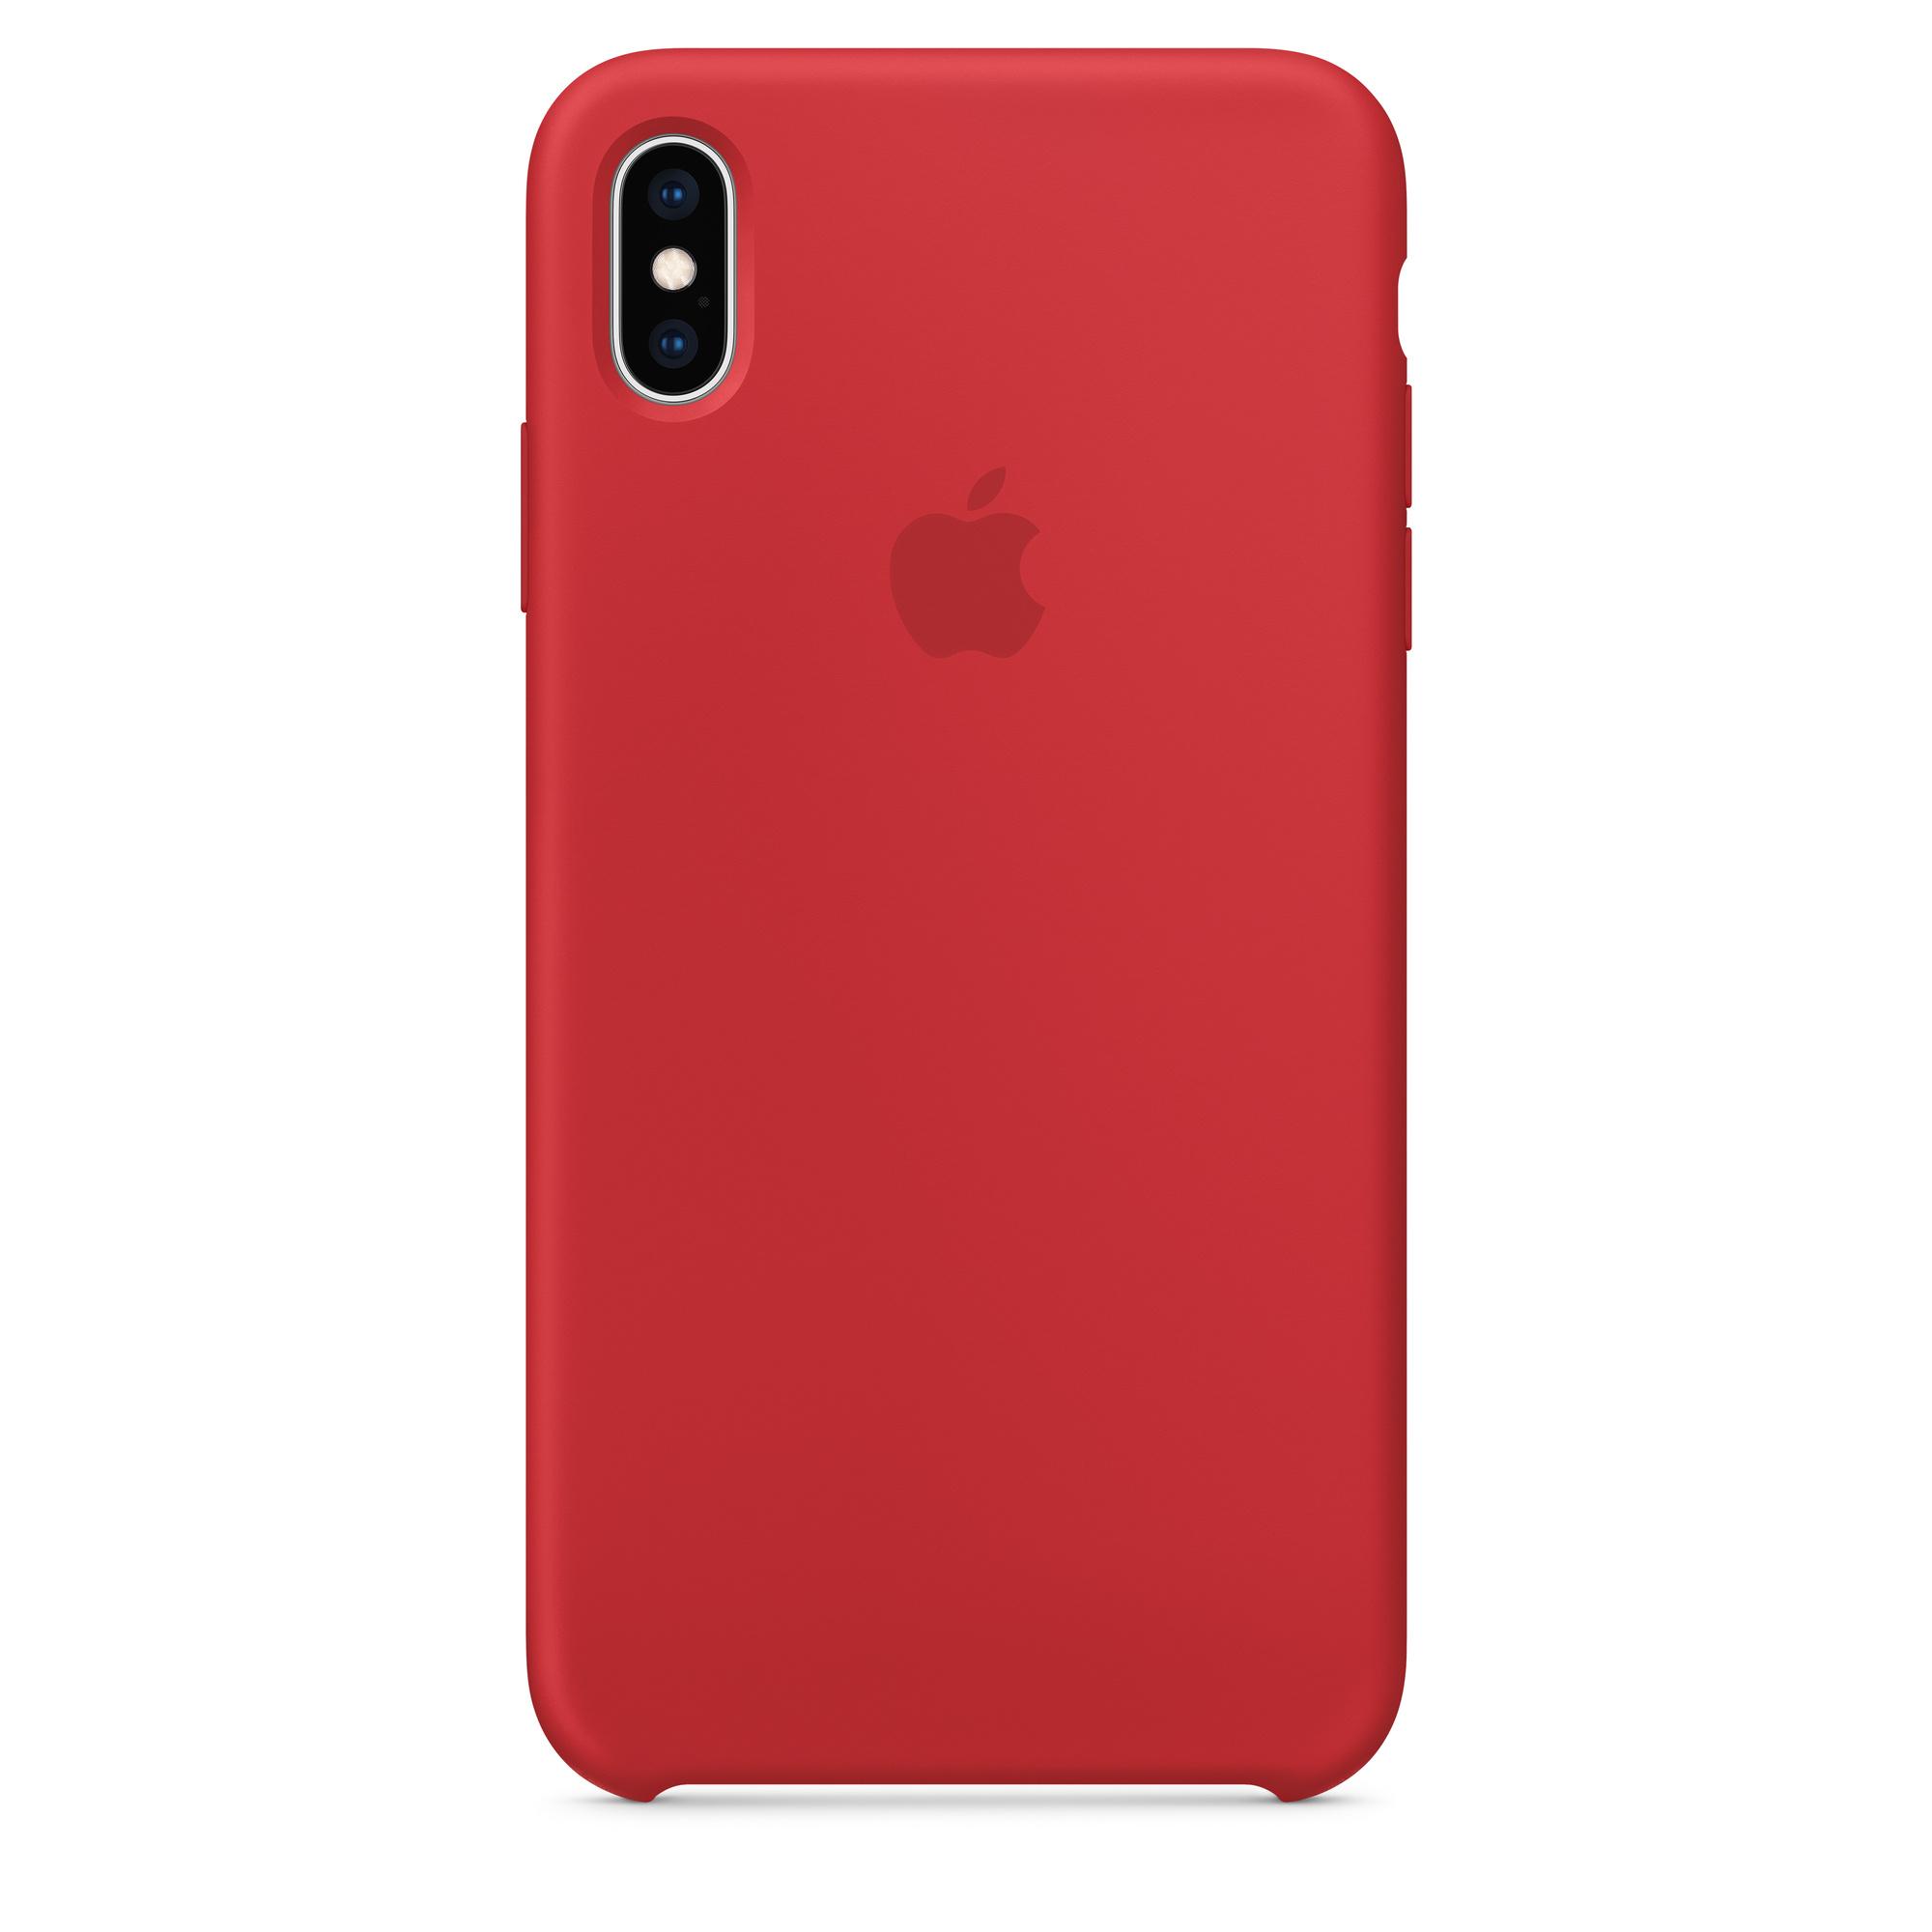 Acquista Apple IPhone Airpods Custodia Protettiva In Pelle Marca